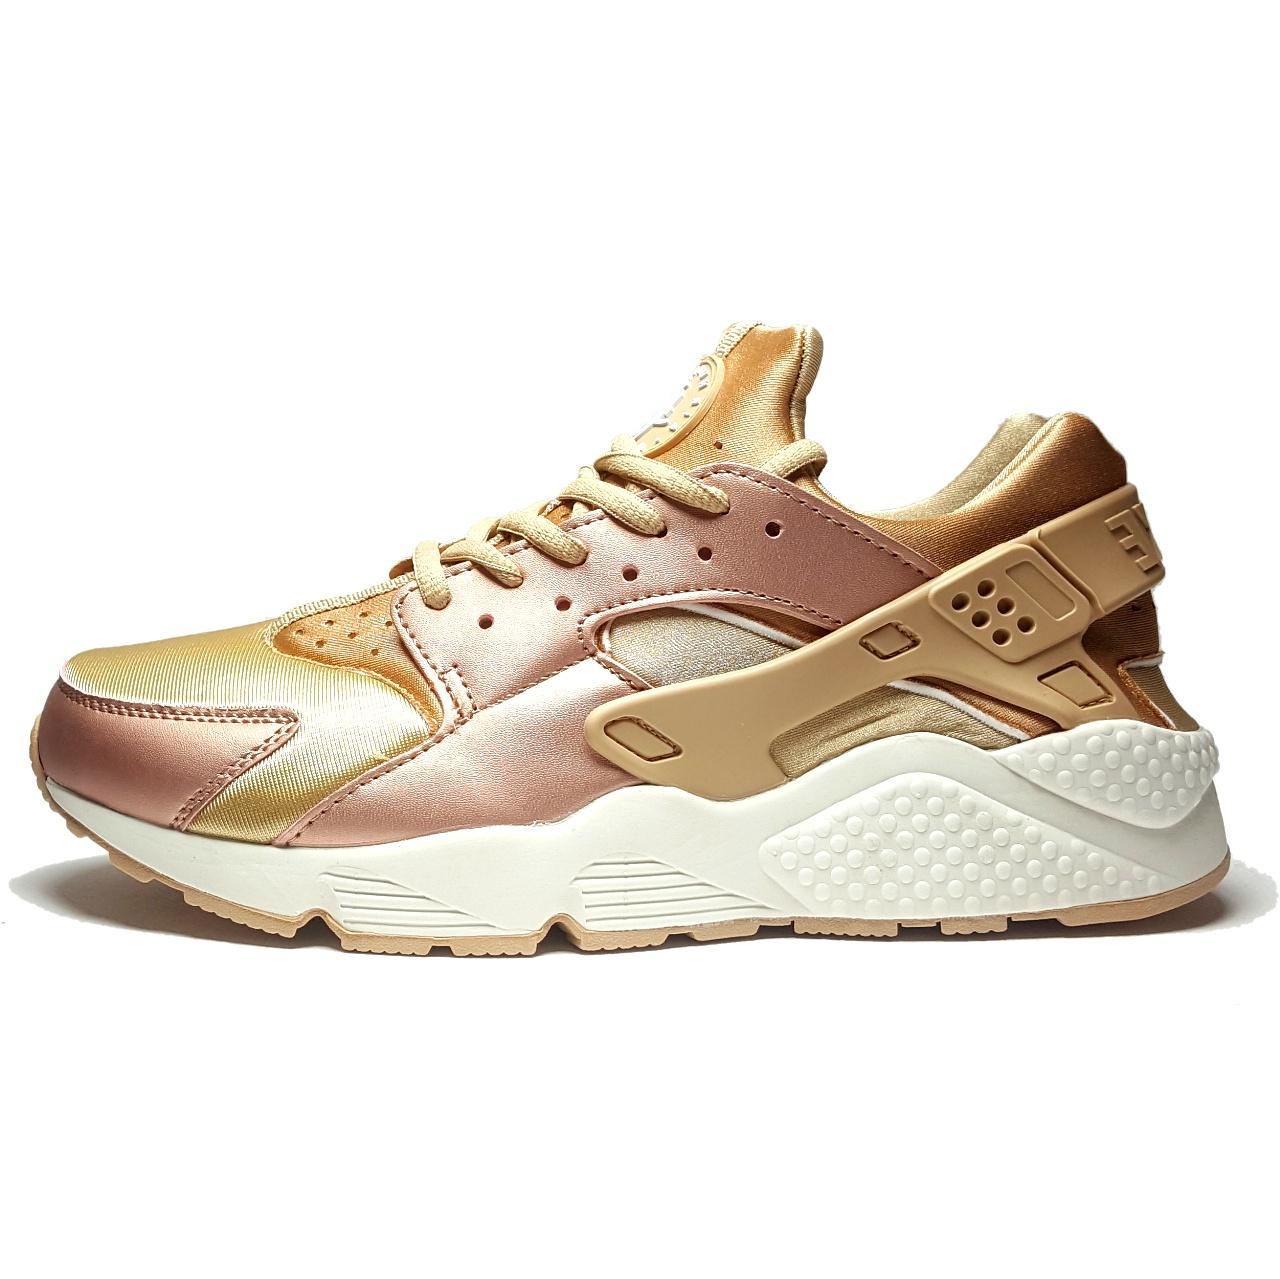 کفش مخصوص دویدن مردانه نایکی مدل Air Huarache Run Se Rose Gold